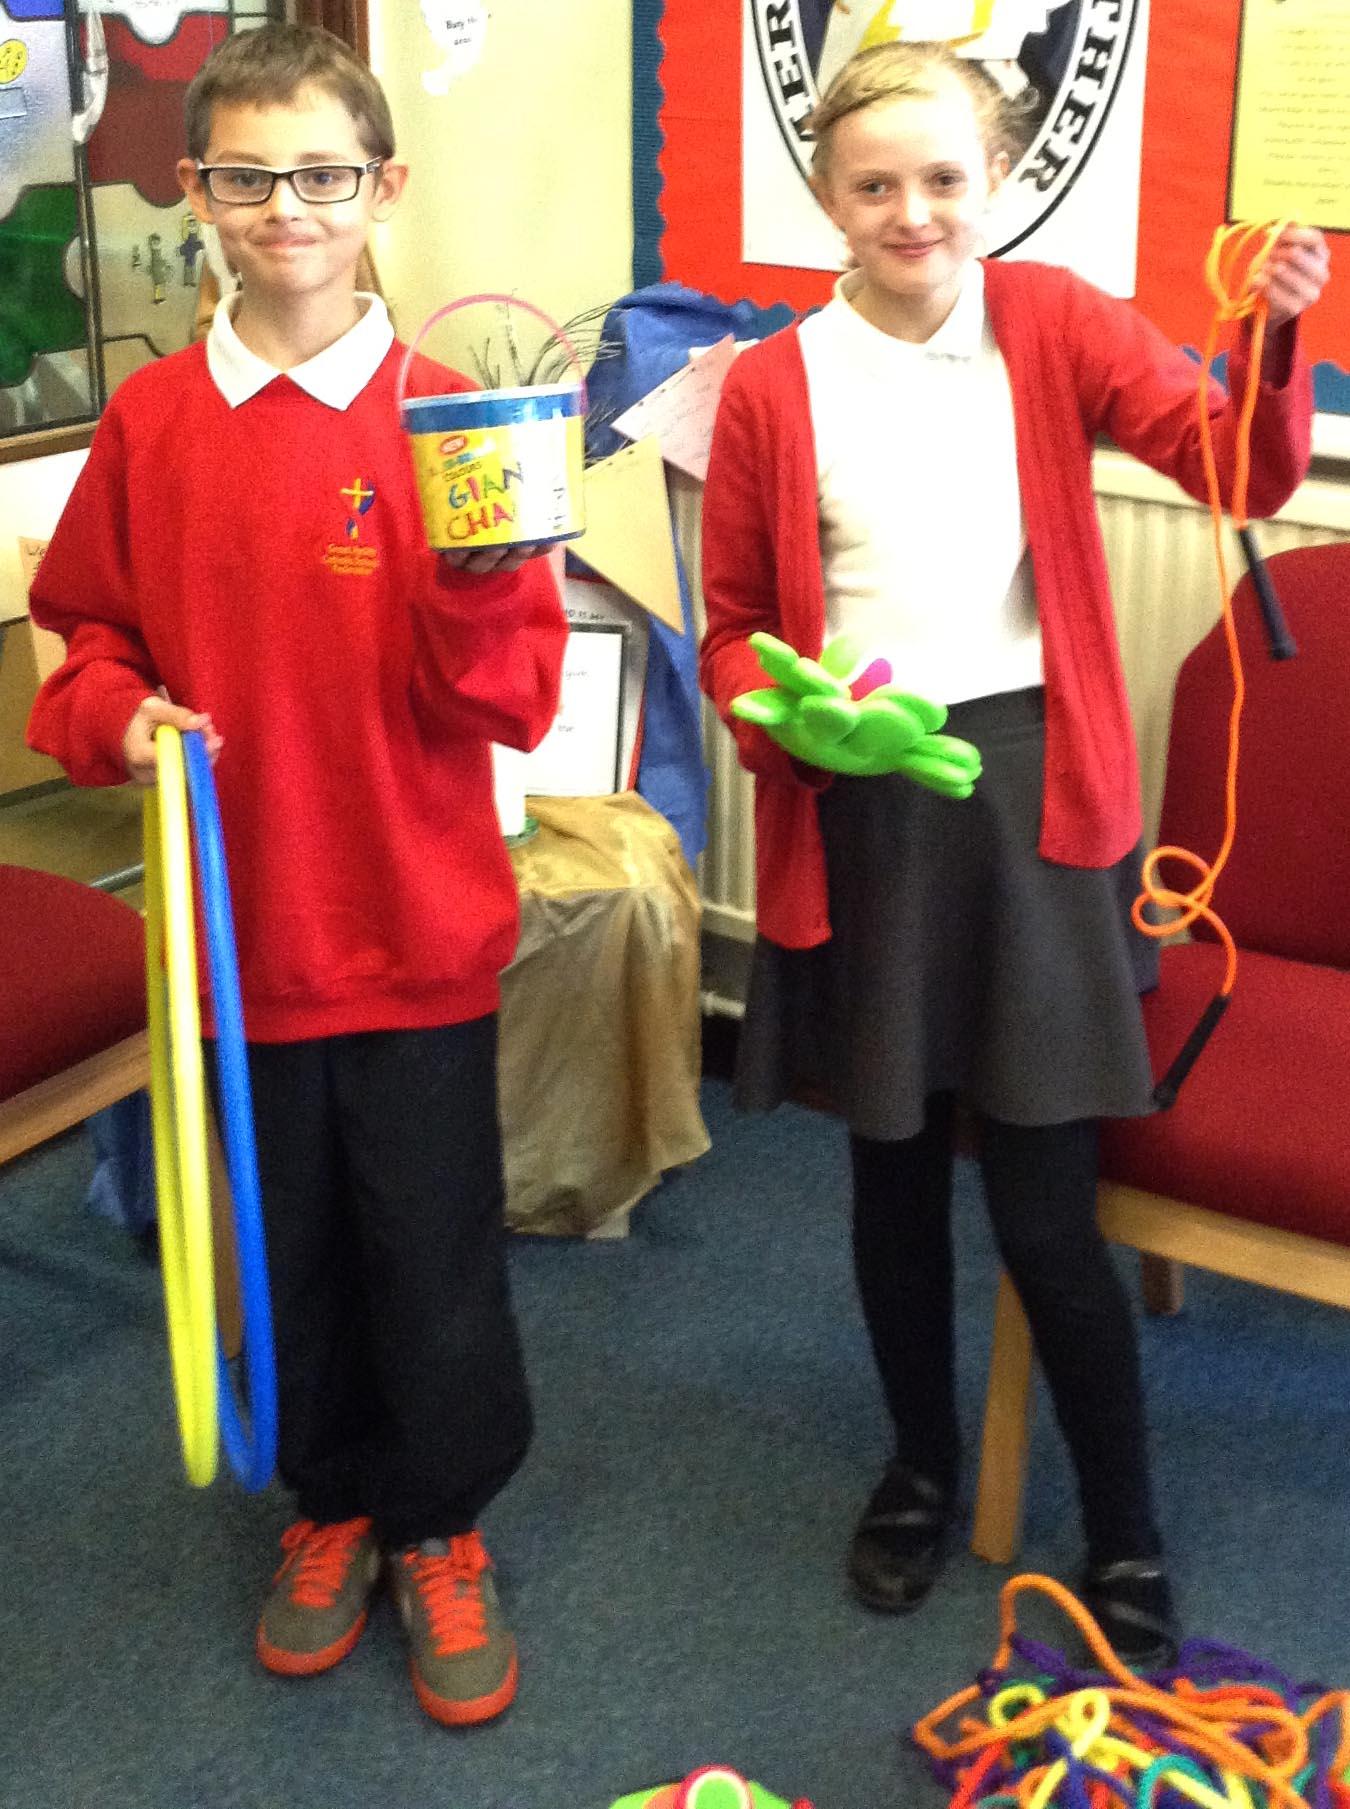 School PTA Provides Play Equipment